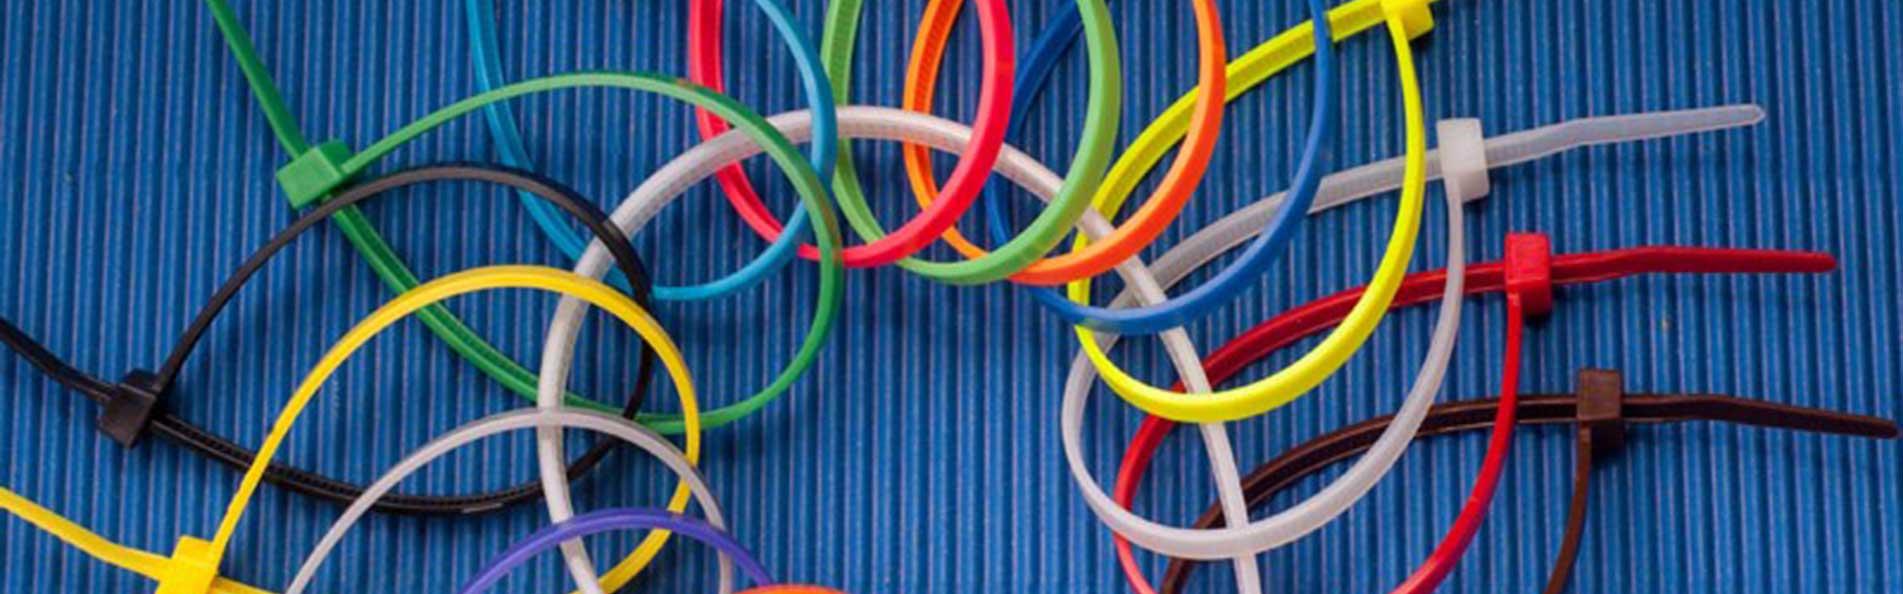 e64ce65a8539 Cable Tie Supplier | Zip Ties & Tie Wraps | Cable Tie Express